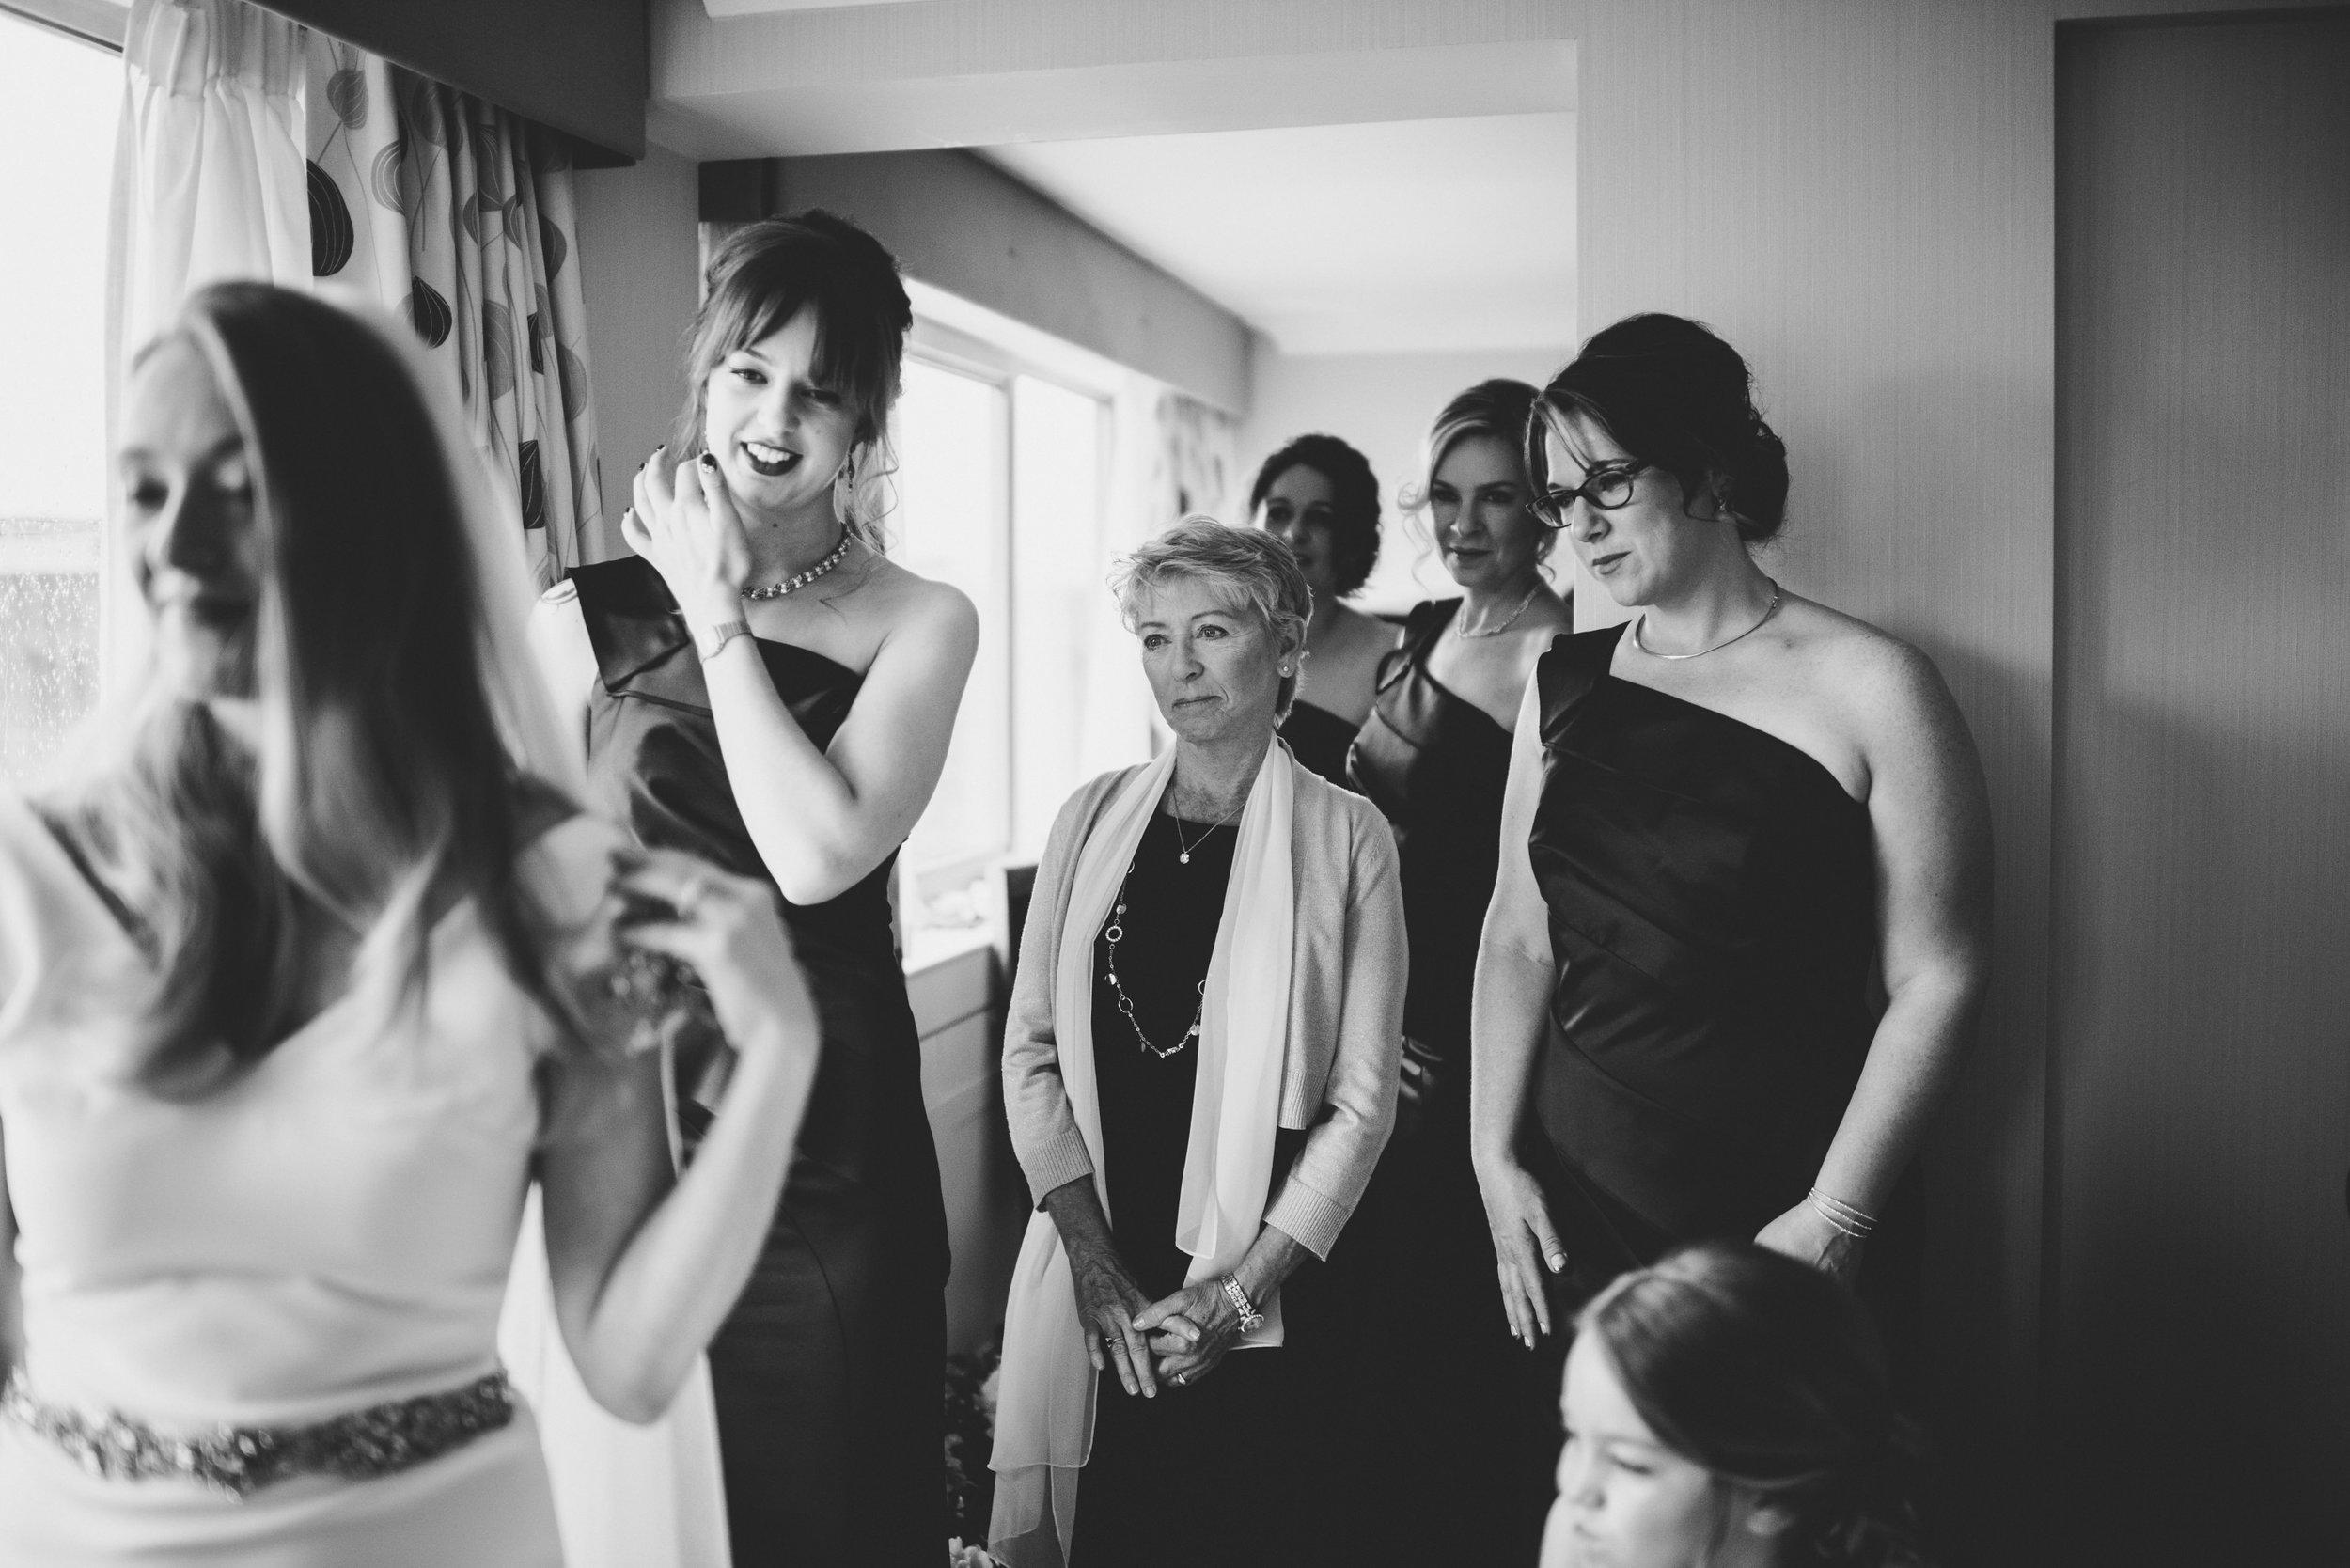 0179-LISA-DEVINE-PHOTOGRAPHY-ALTERNATIVE-WEDDING-PHOTOGRAPHY-SCOTLAND-DESTINATION-WEDDINGS-GLASGOW-WEDDINGS-COOL-WEDDINGS-STYLISH-WEDDINGS.JPG